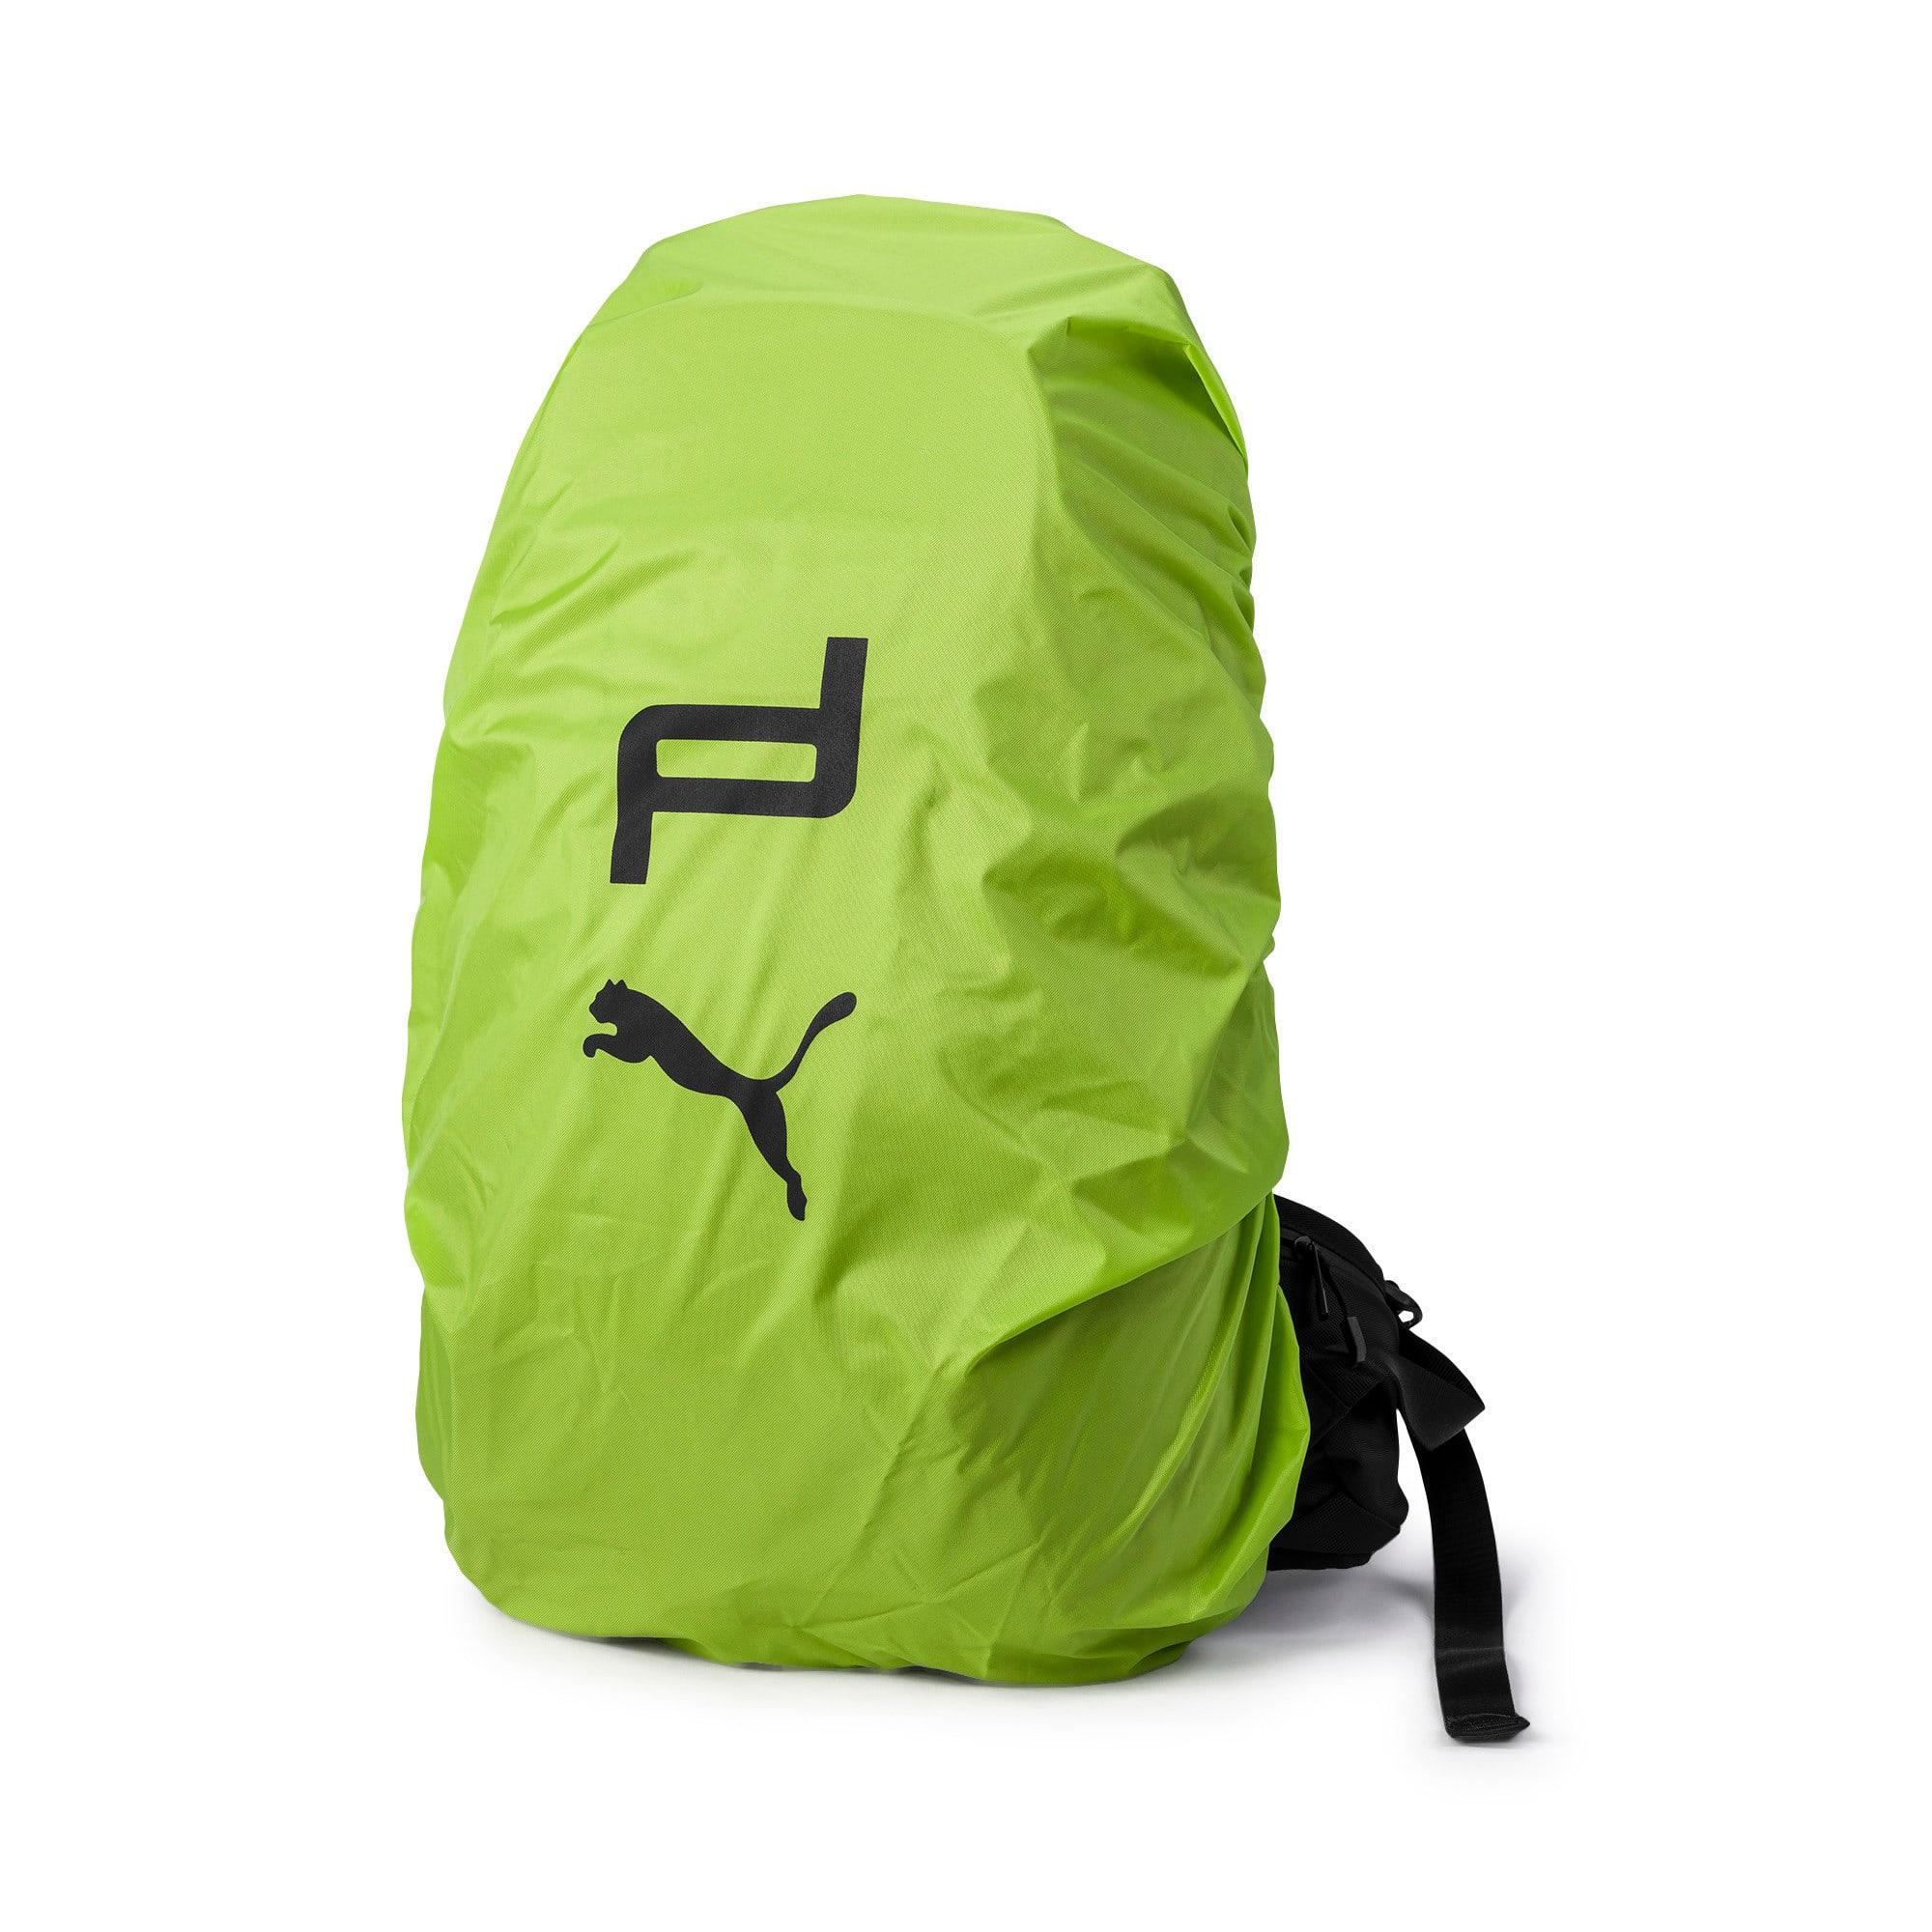 Thumbnail 7 of Porsche Design evoKNIT Active Backpack, Puma Black, medium